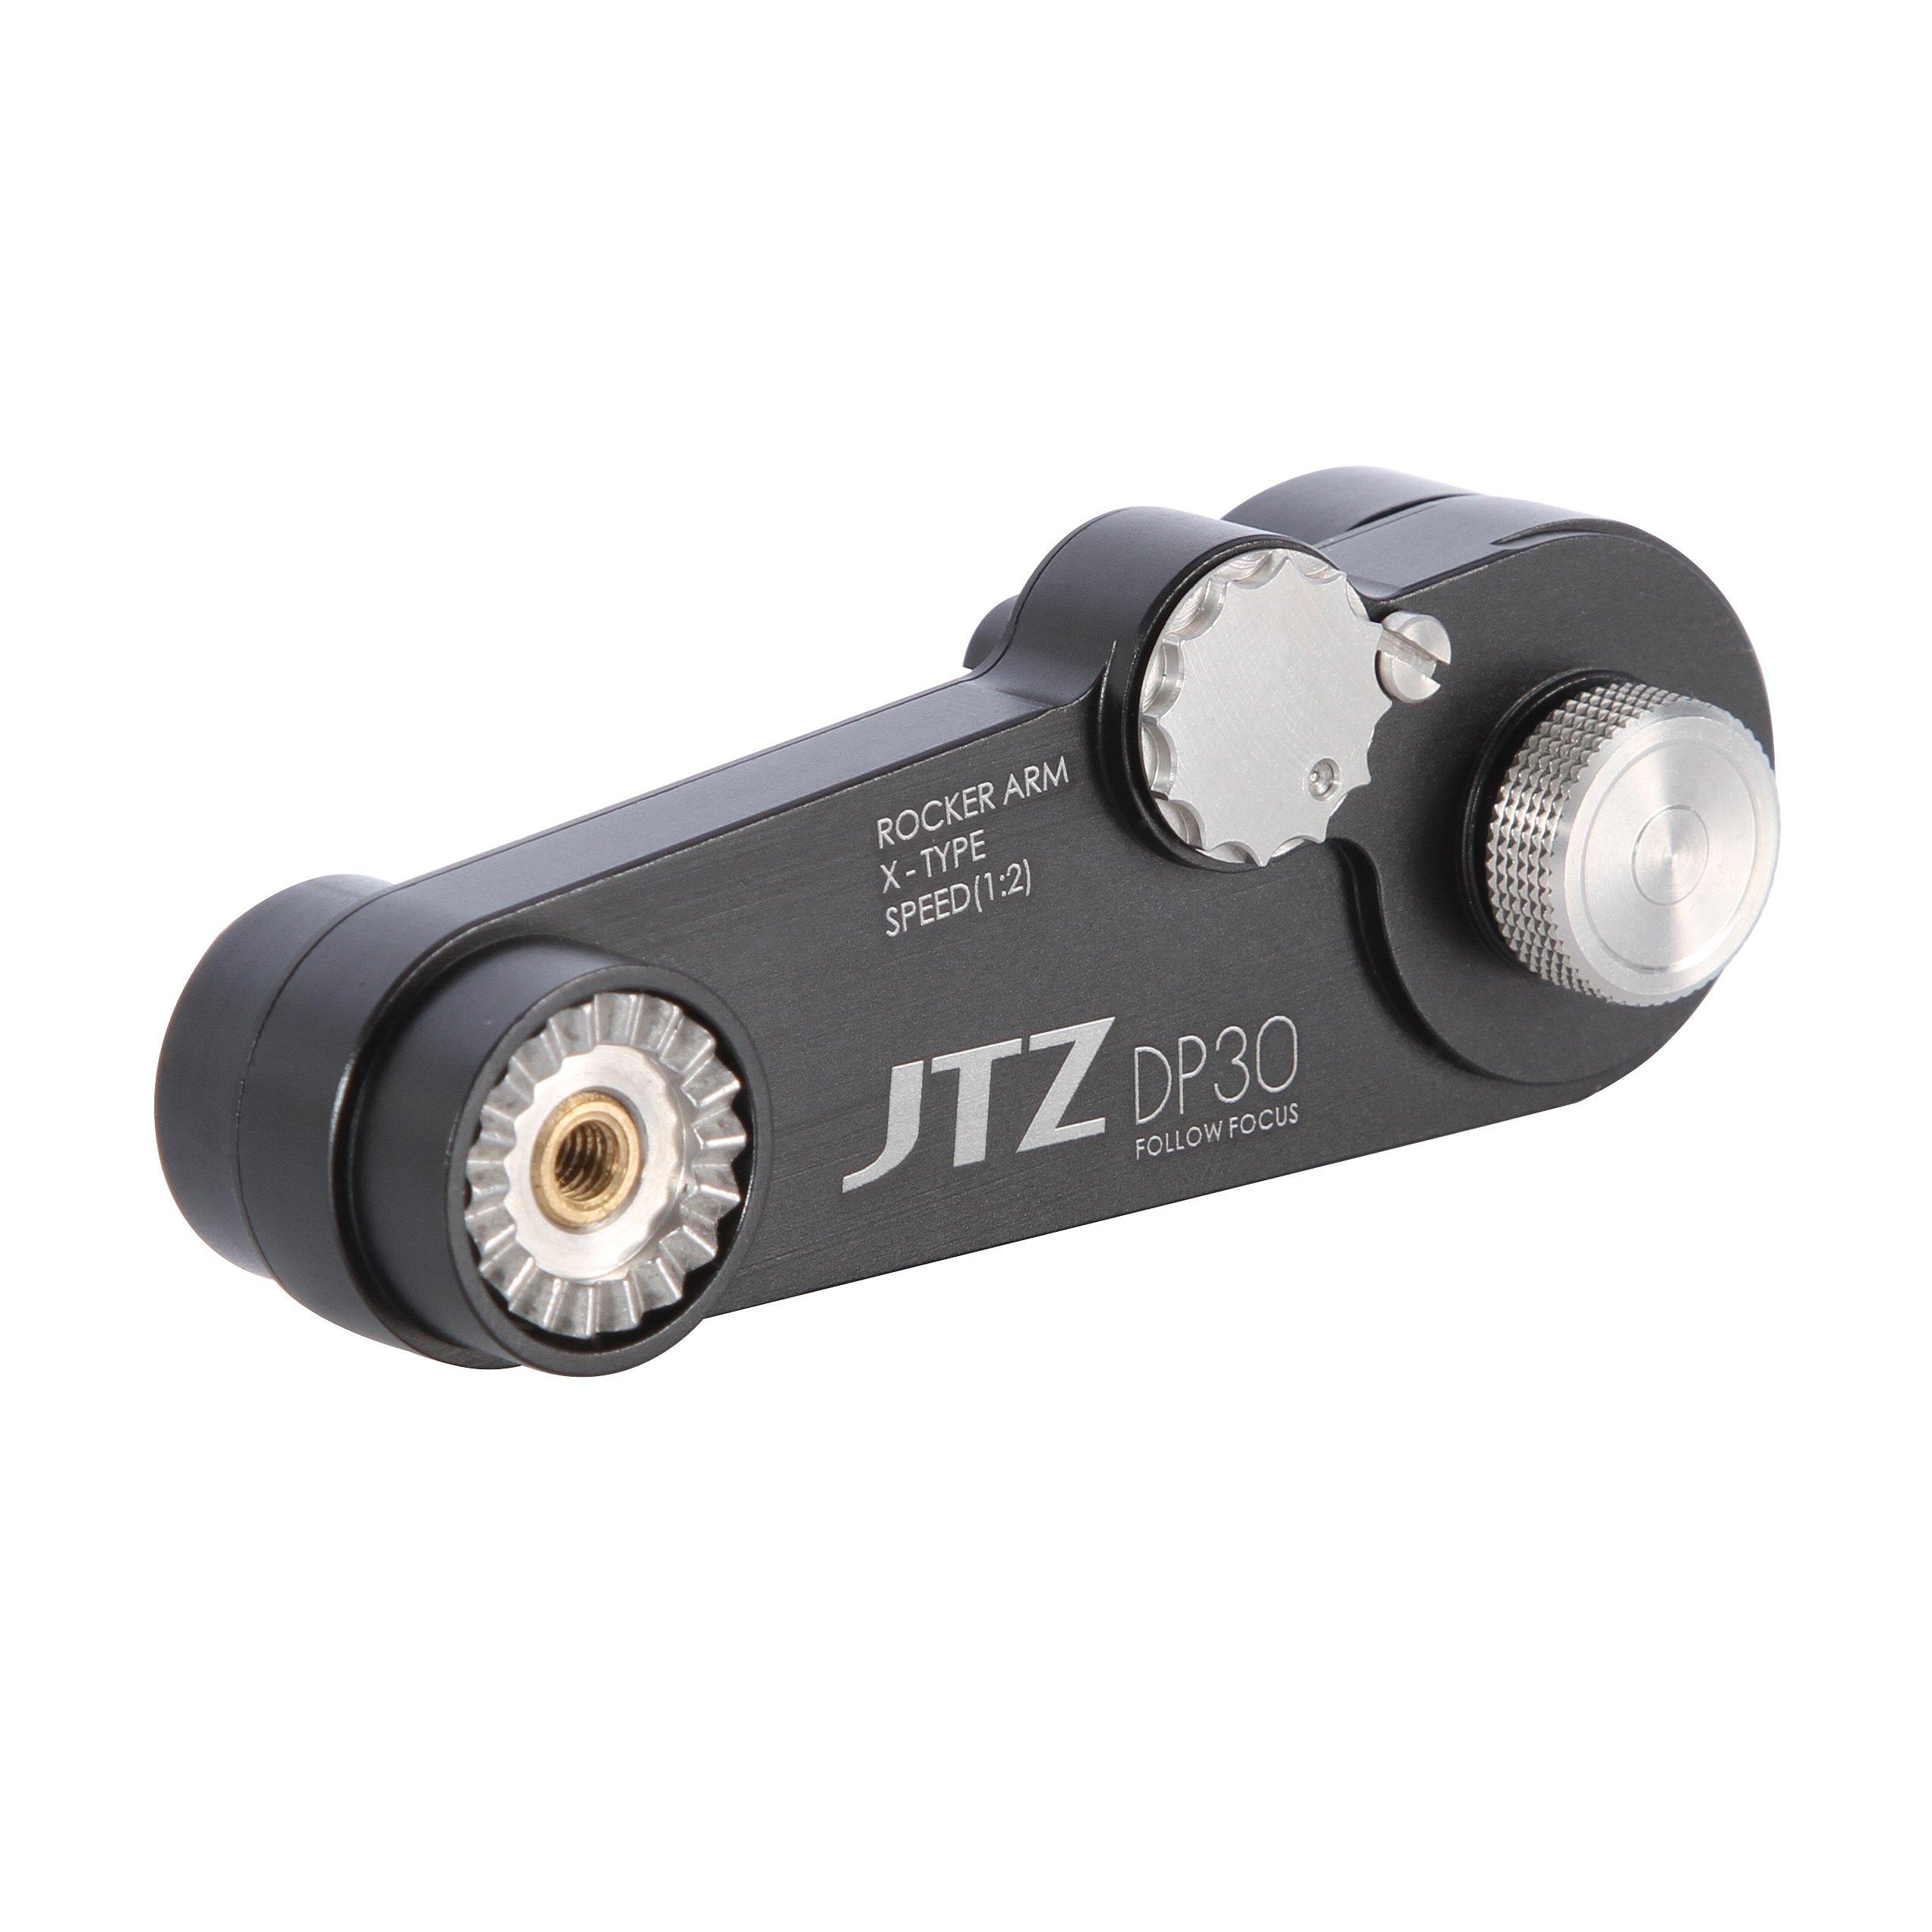 JTZ 1:2 Extension Arm for DP30 Cine Camera Follow Focus Canon C100 Sony A7 A9 Panasonic GH4 GH5 etc. by JTZ